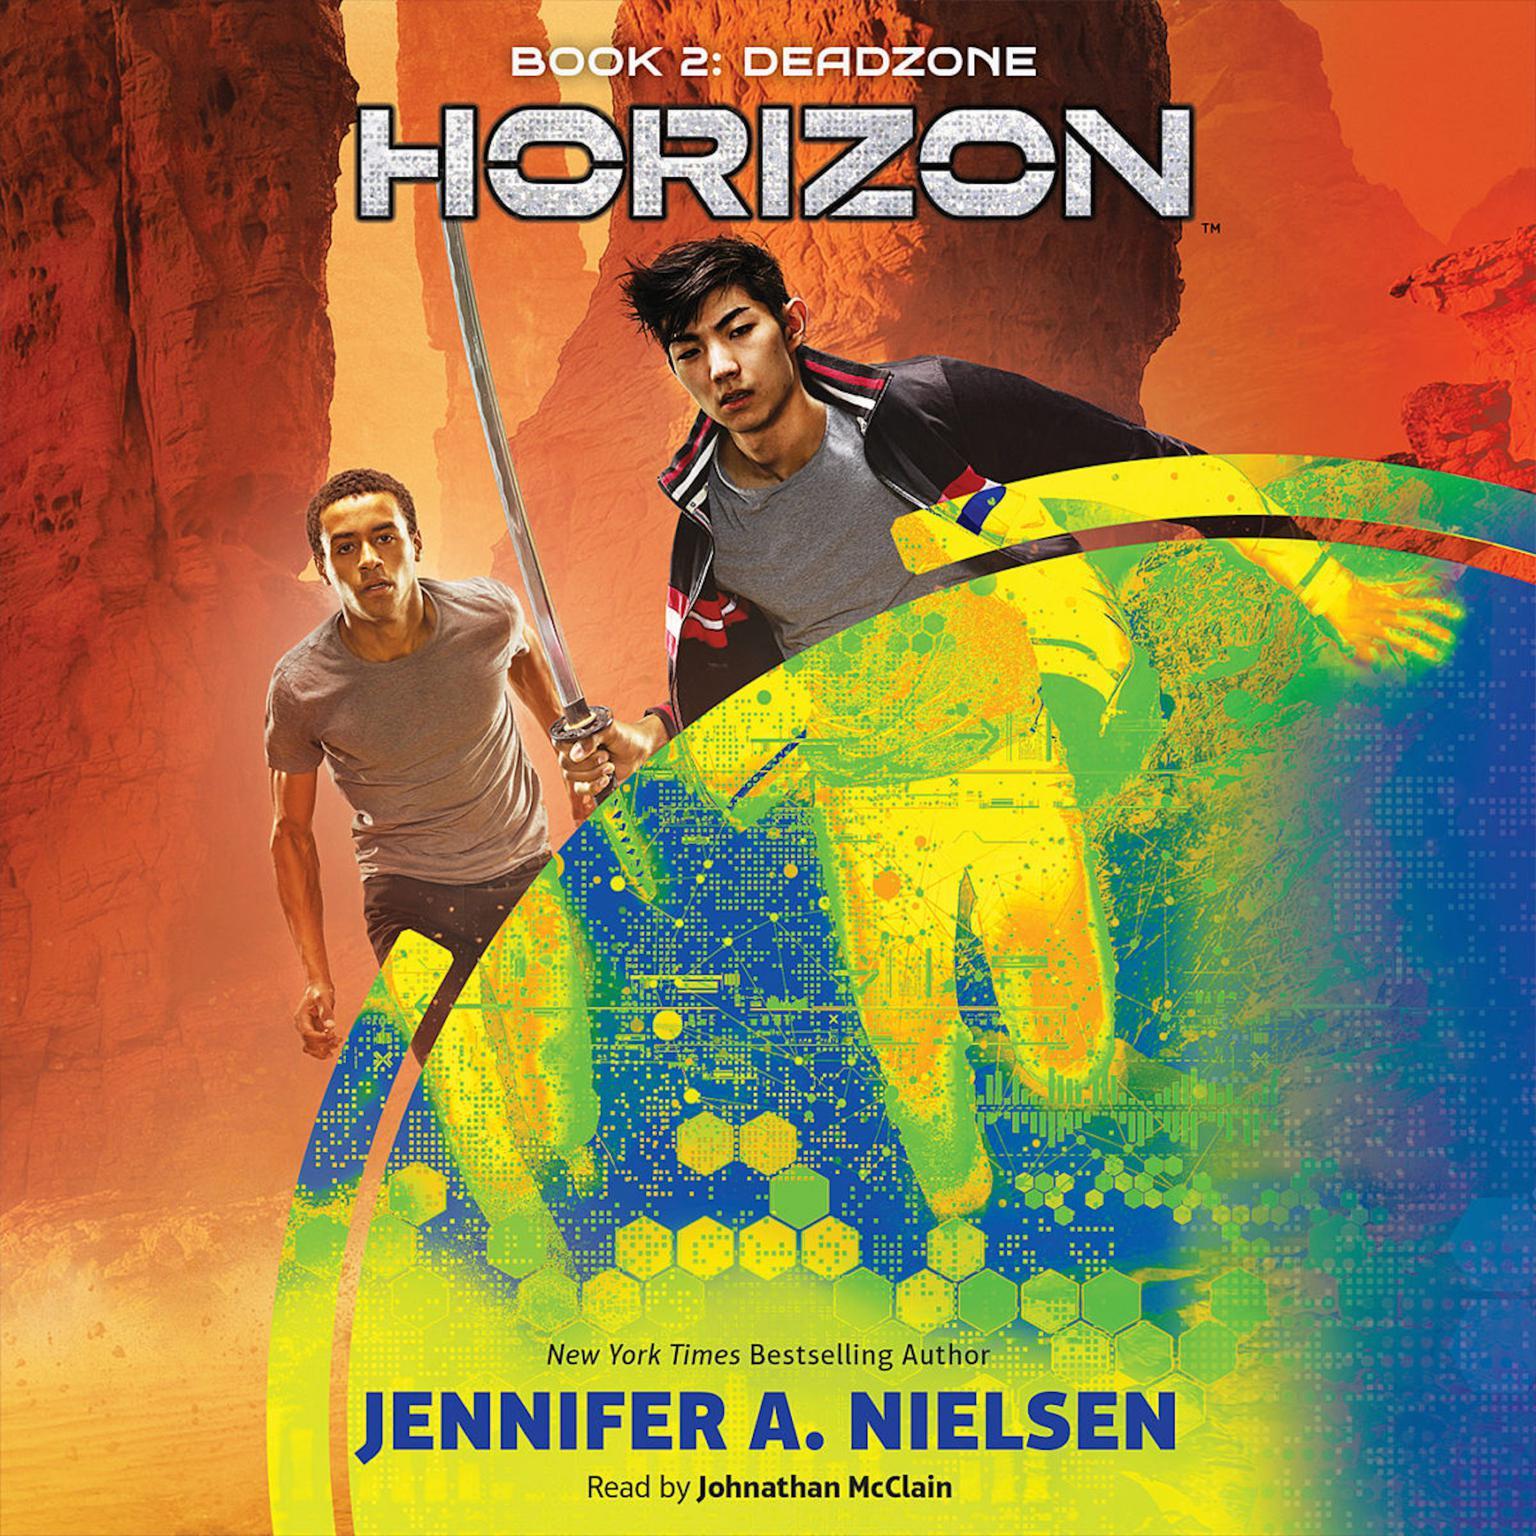 Printable Deadzone (Horizon, Book 2) Audiobook Cover Art